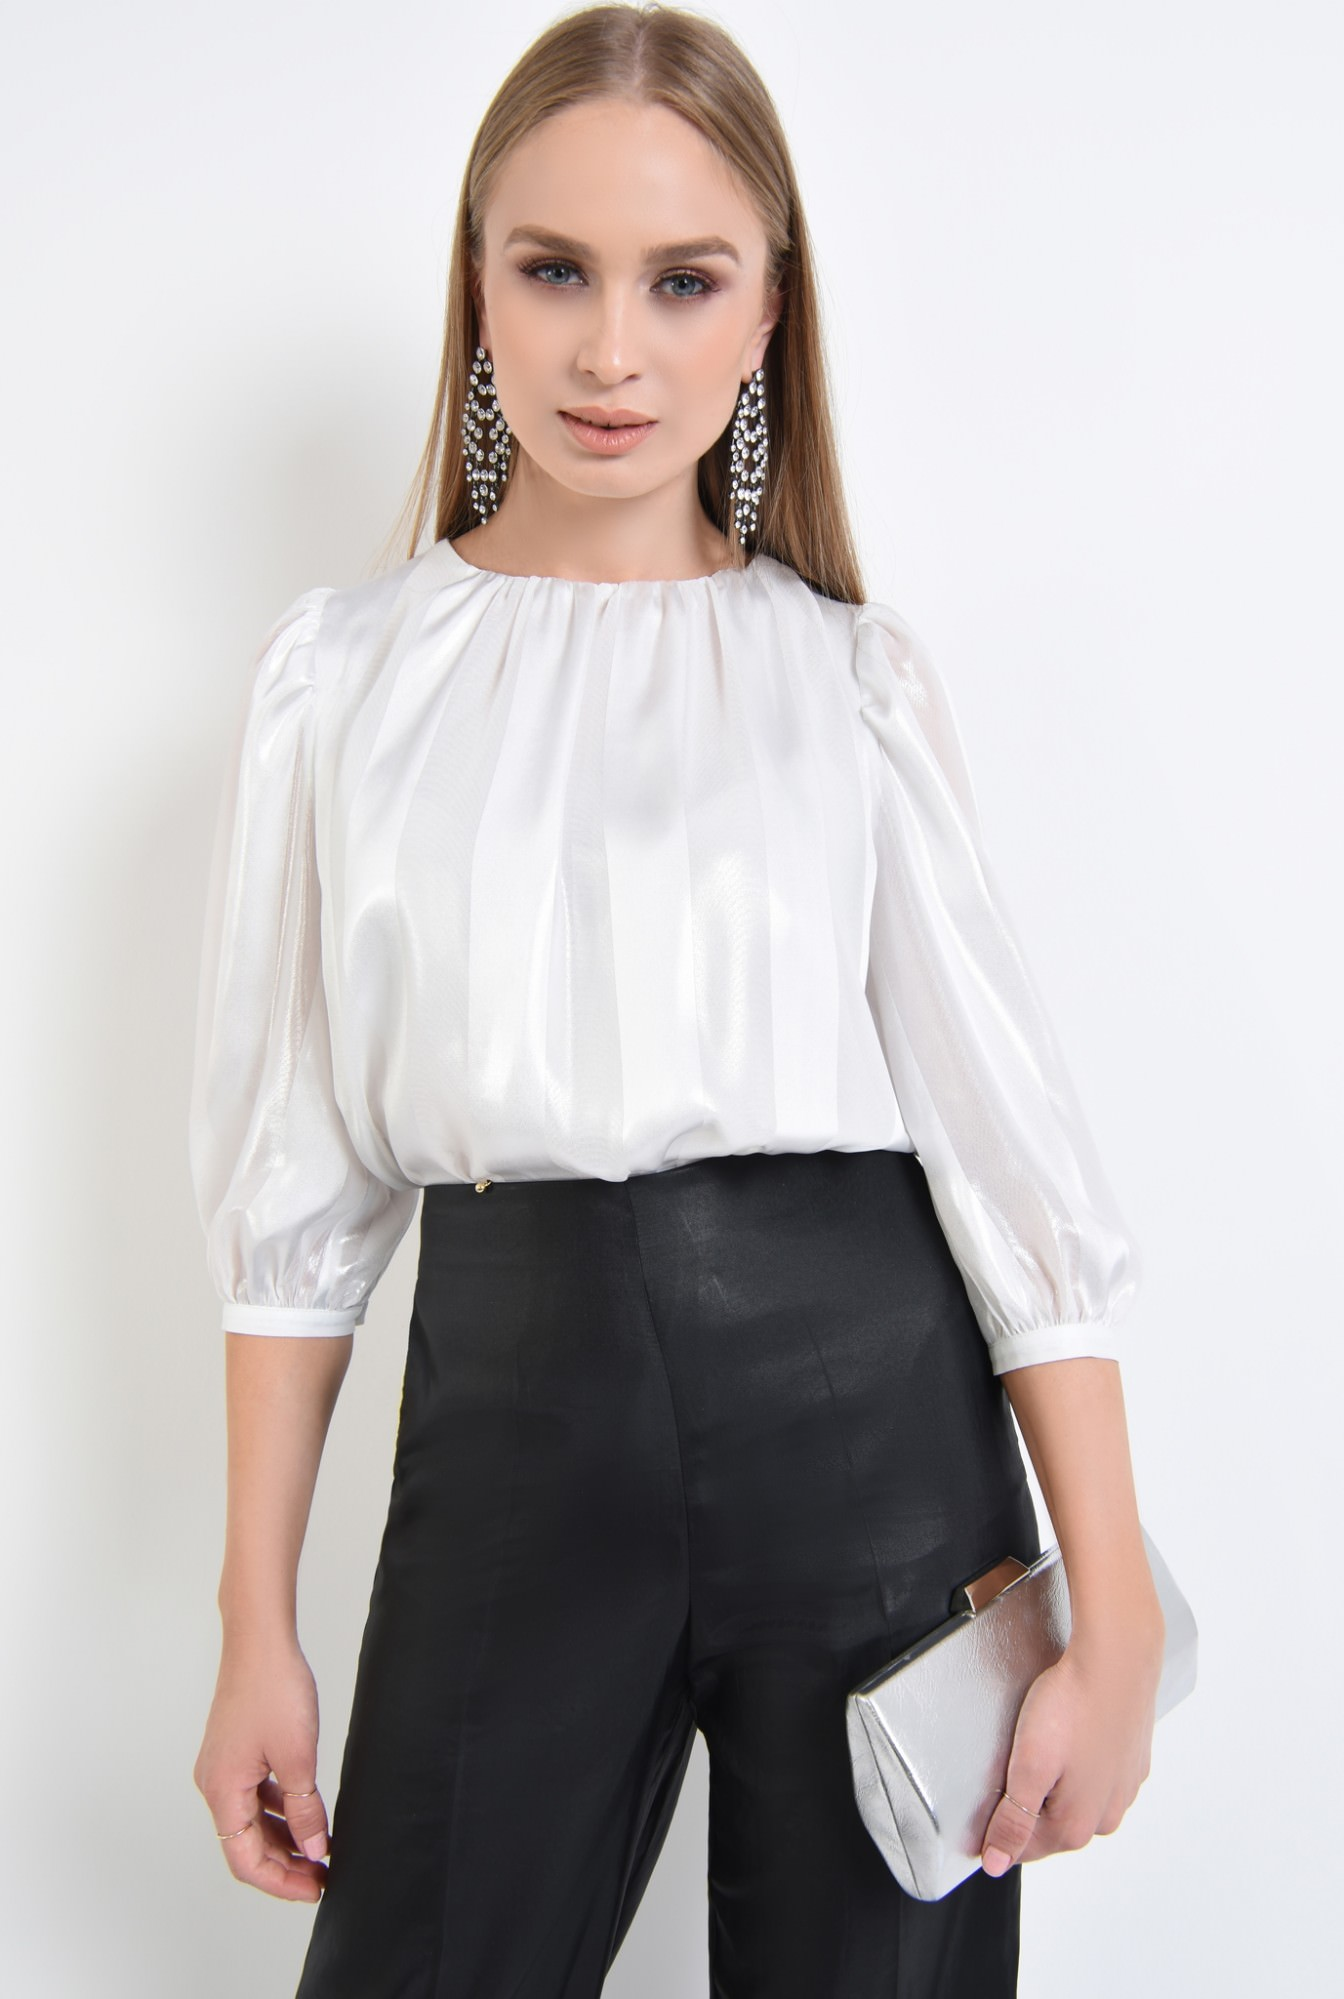 0 - 360 - bluza eleganta argintie, sifon, dungi, pliseuri la decolteu